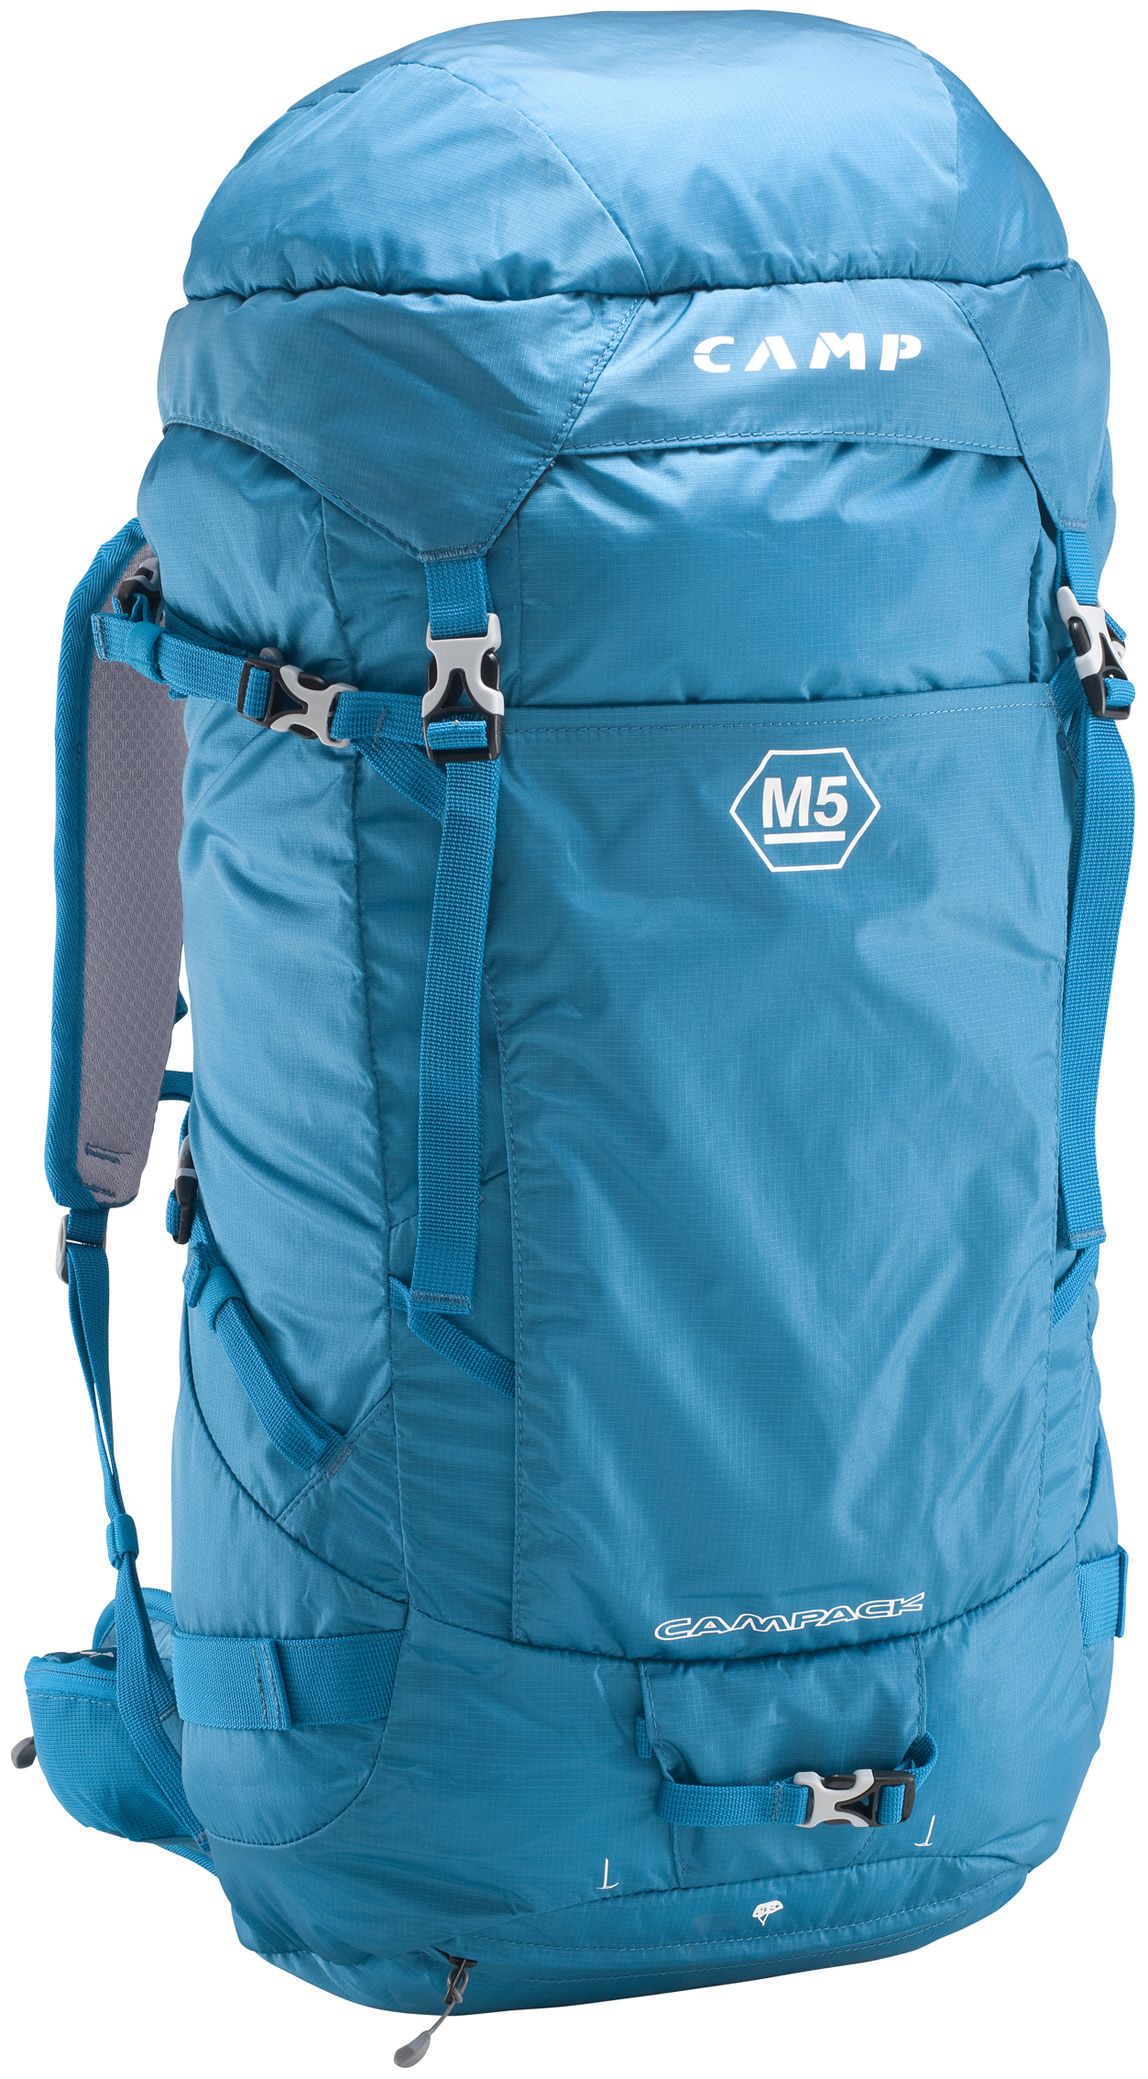 CAMP M5